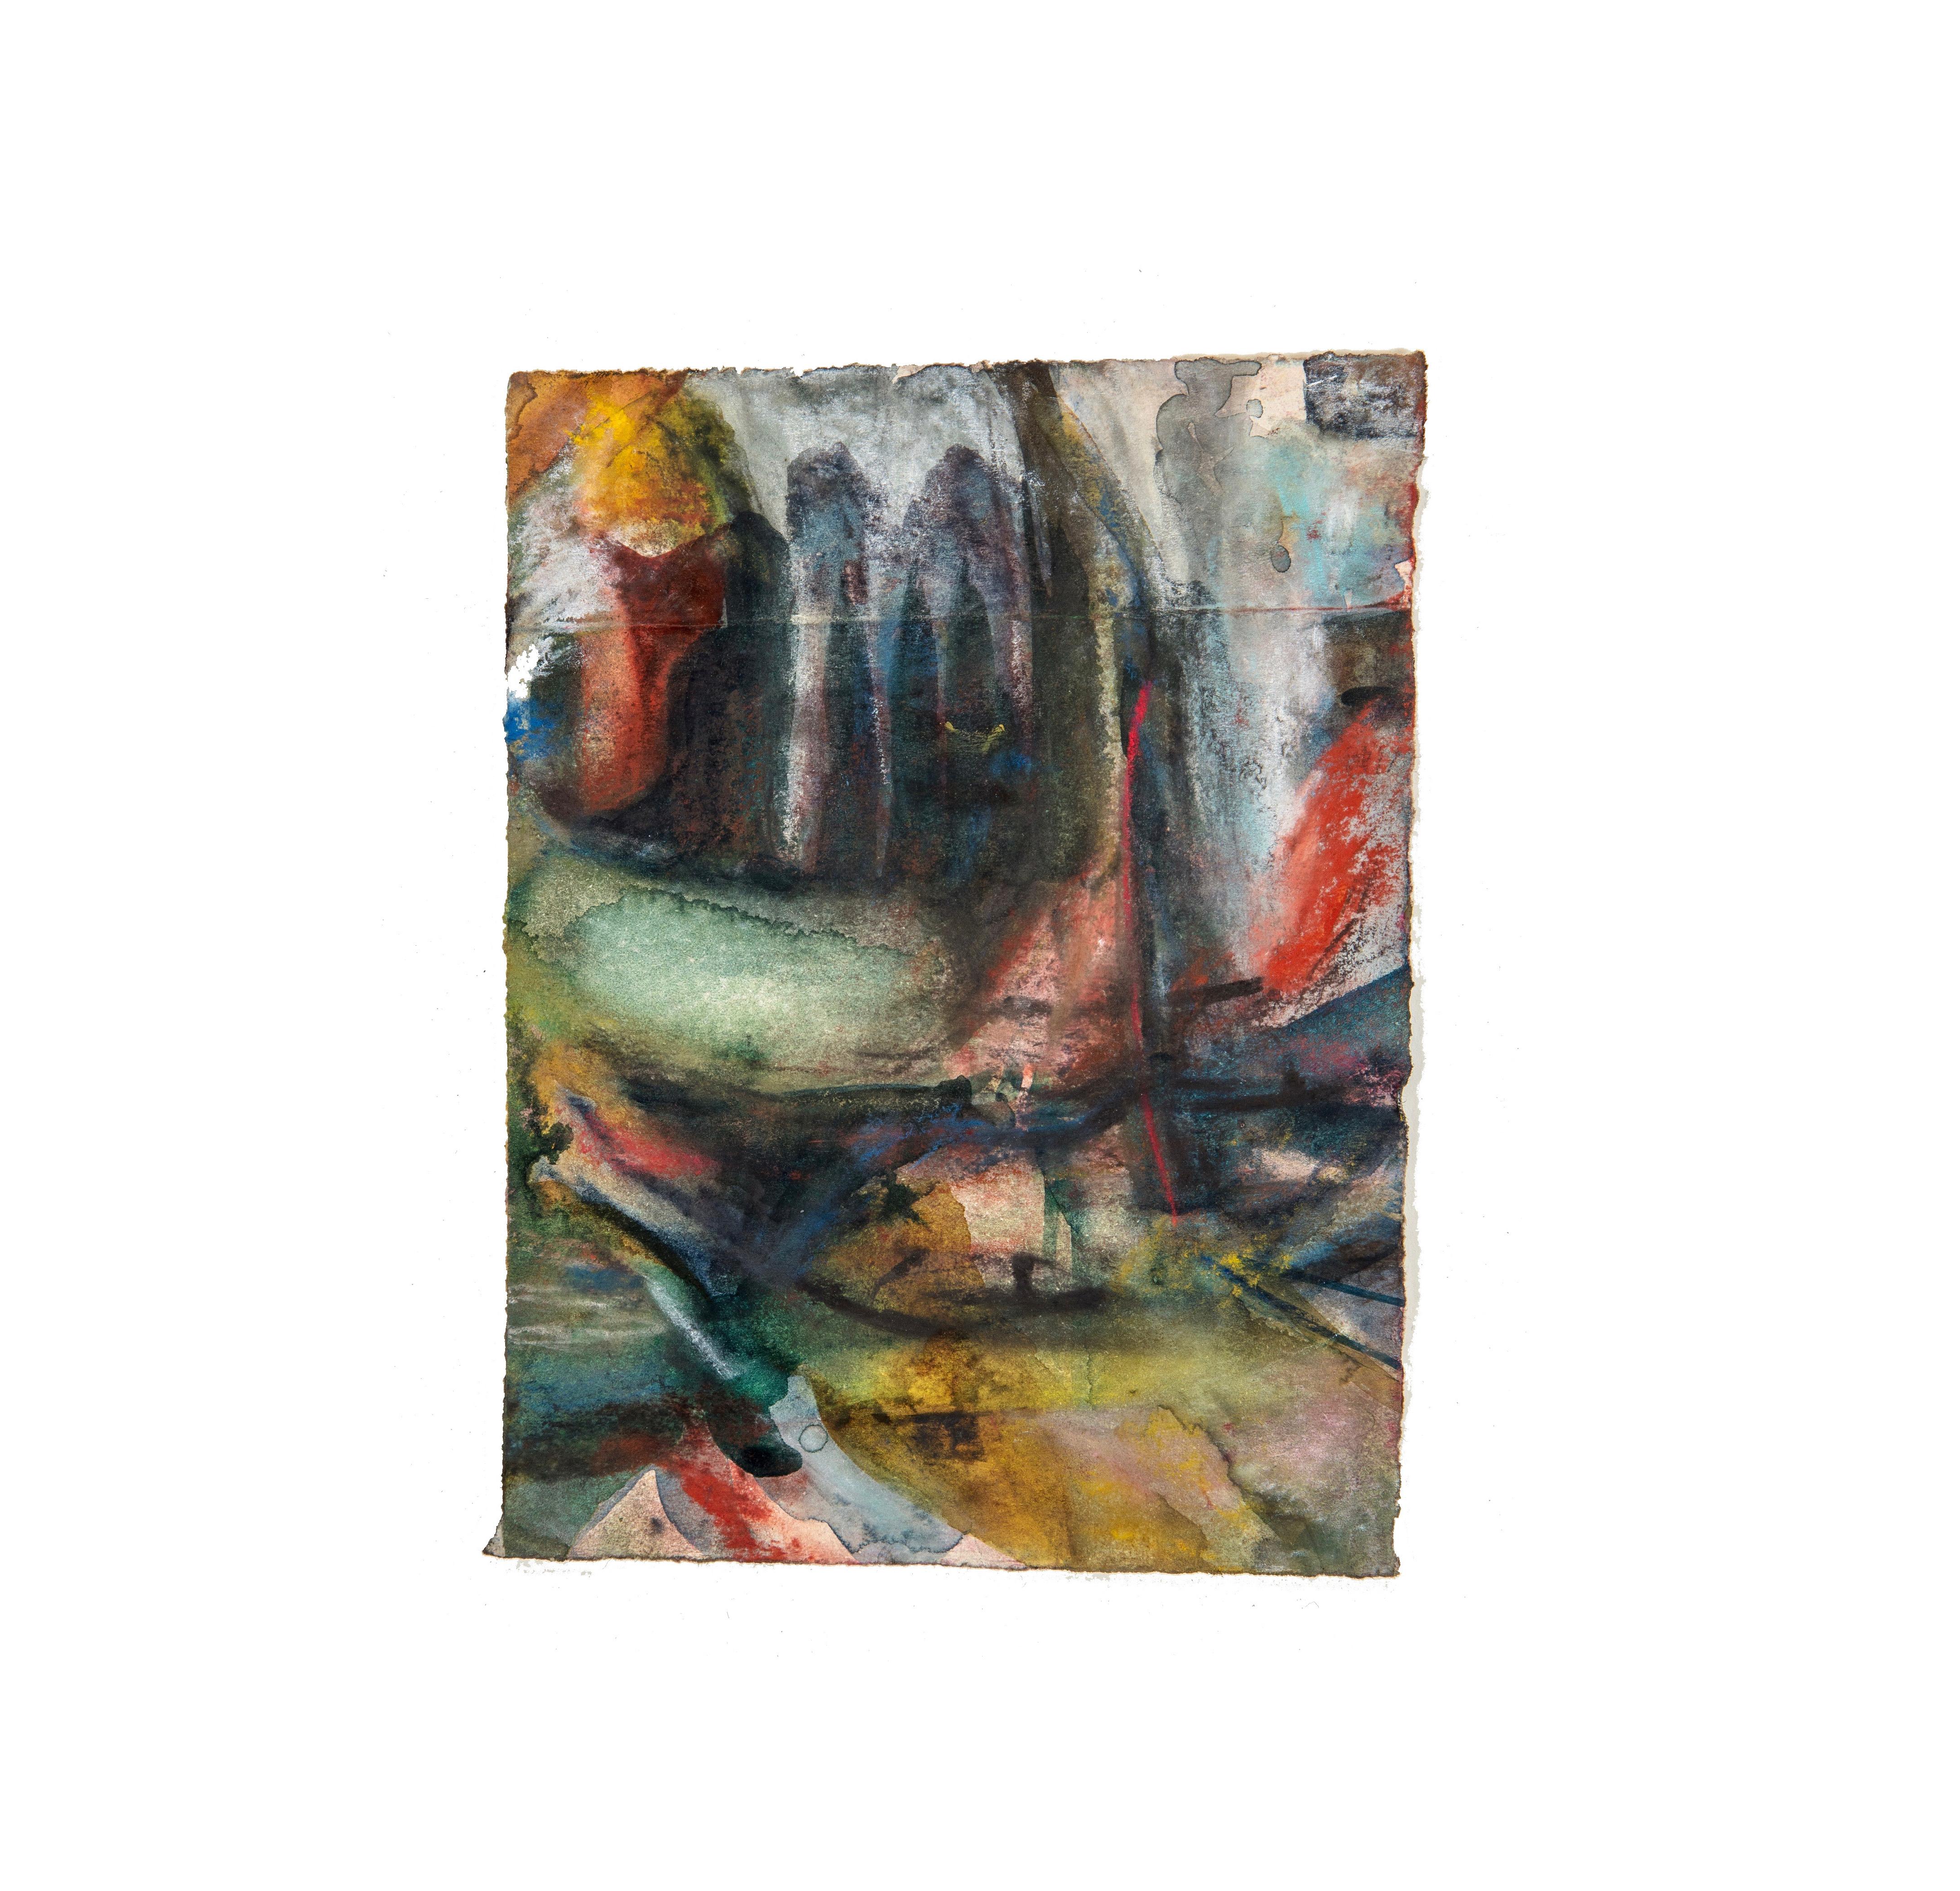 soft avenue. Watercolour and pencil on paper. 15cm x 13cm